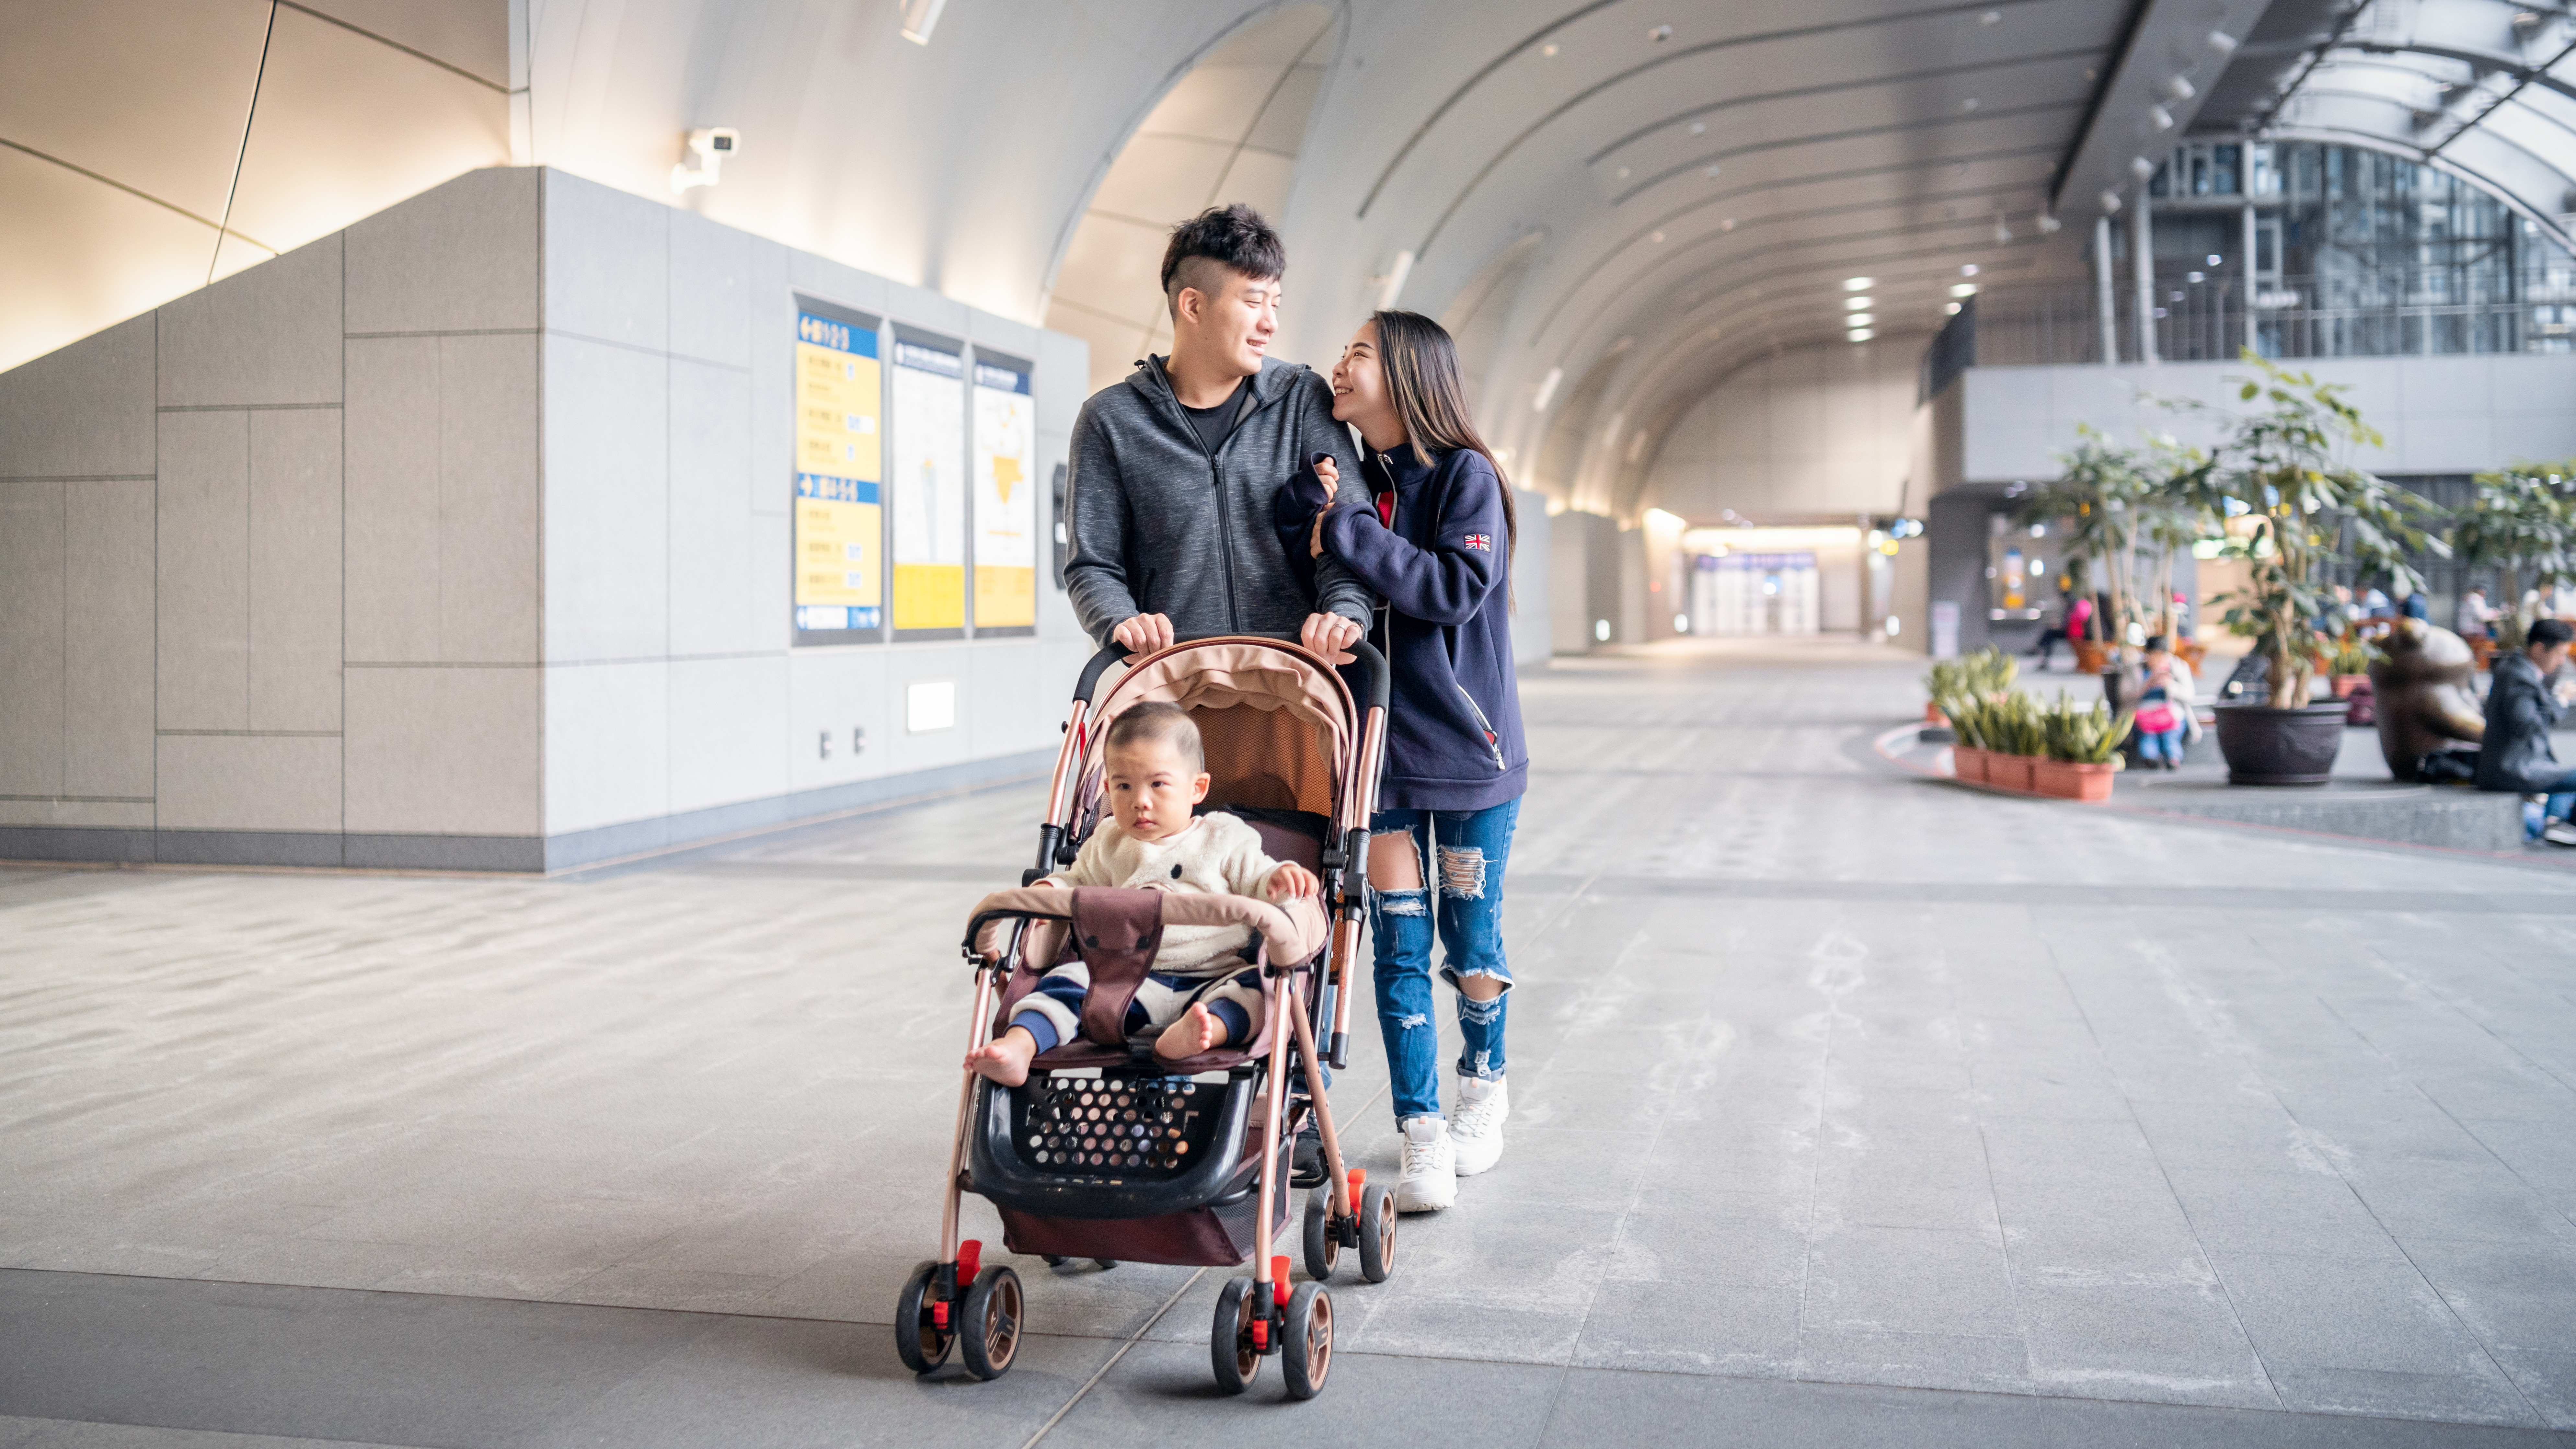 Portable foldable cabin lightweight baby stroller pushchair pram